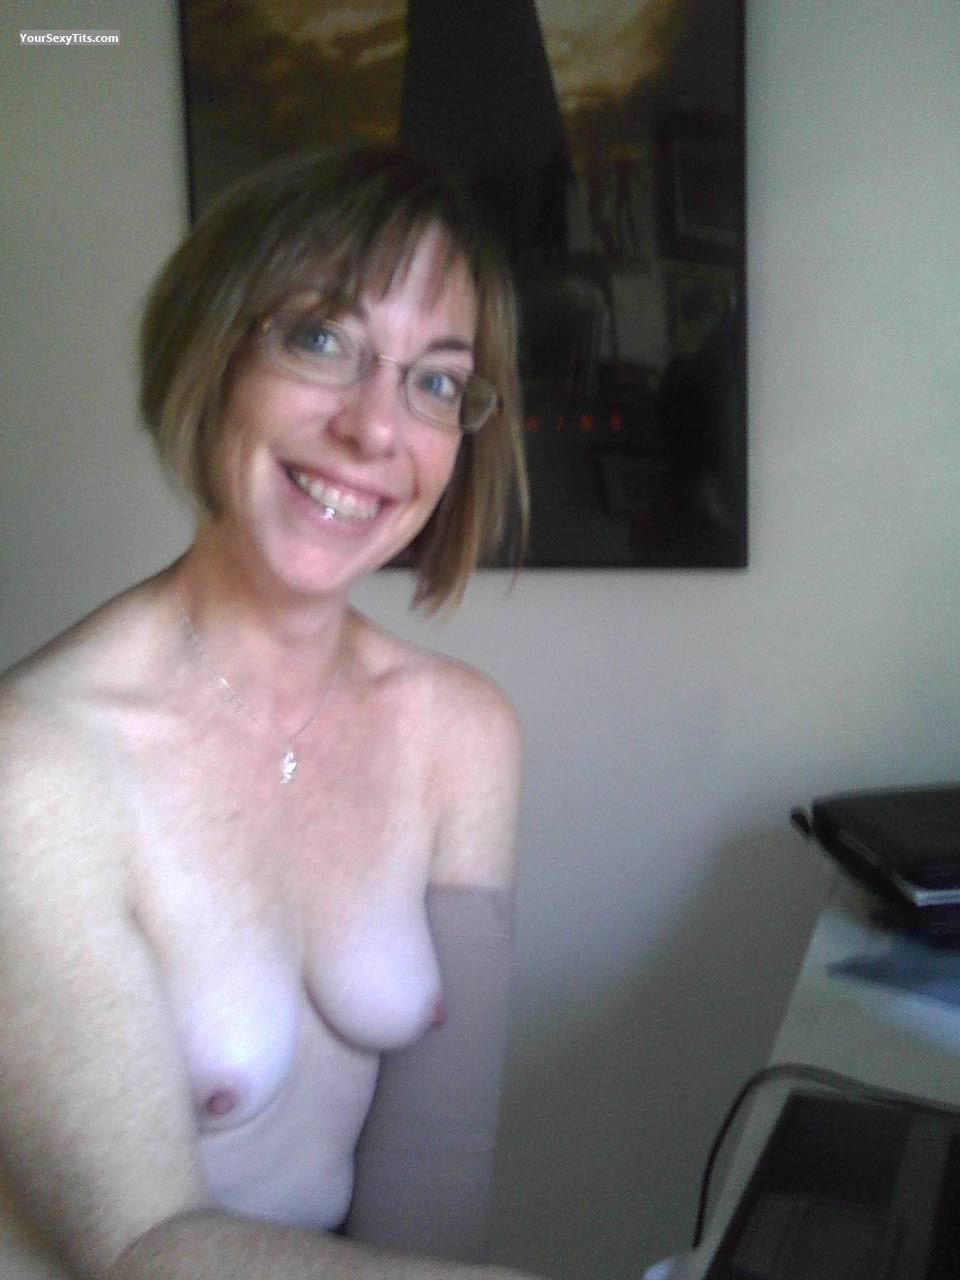 Small Pink Tits 64